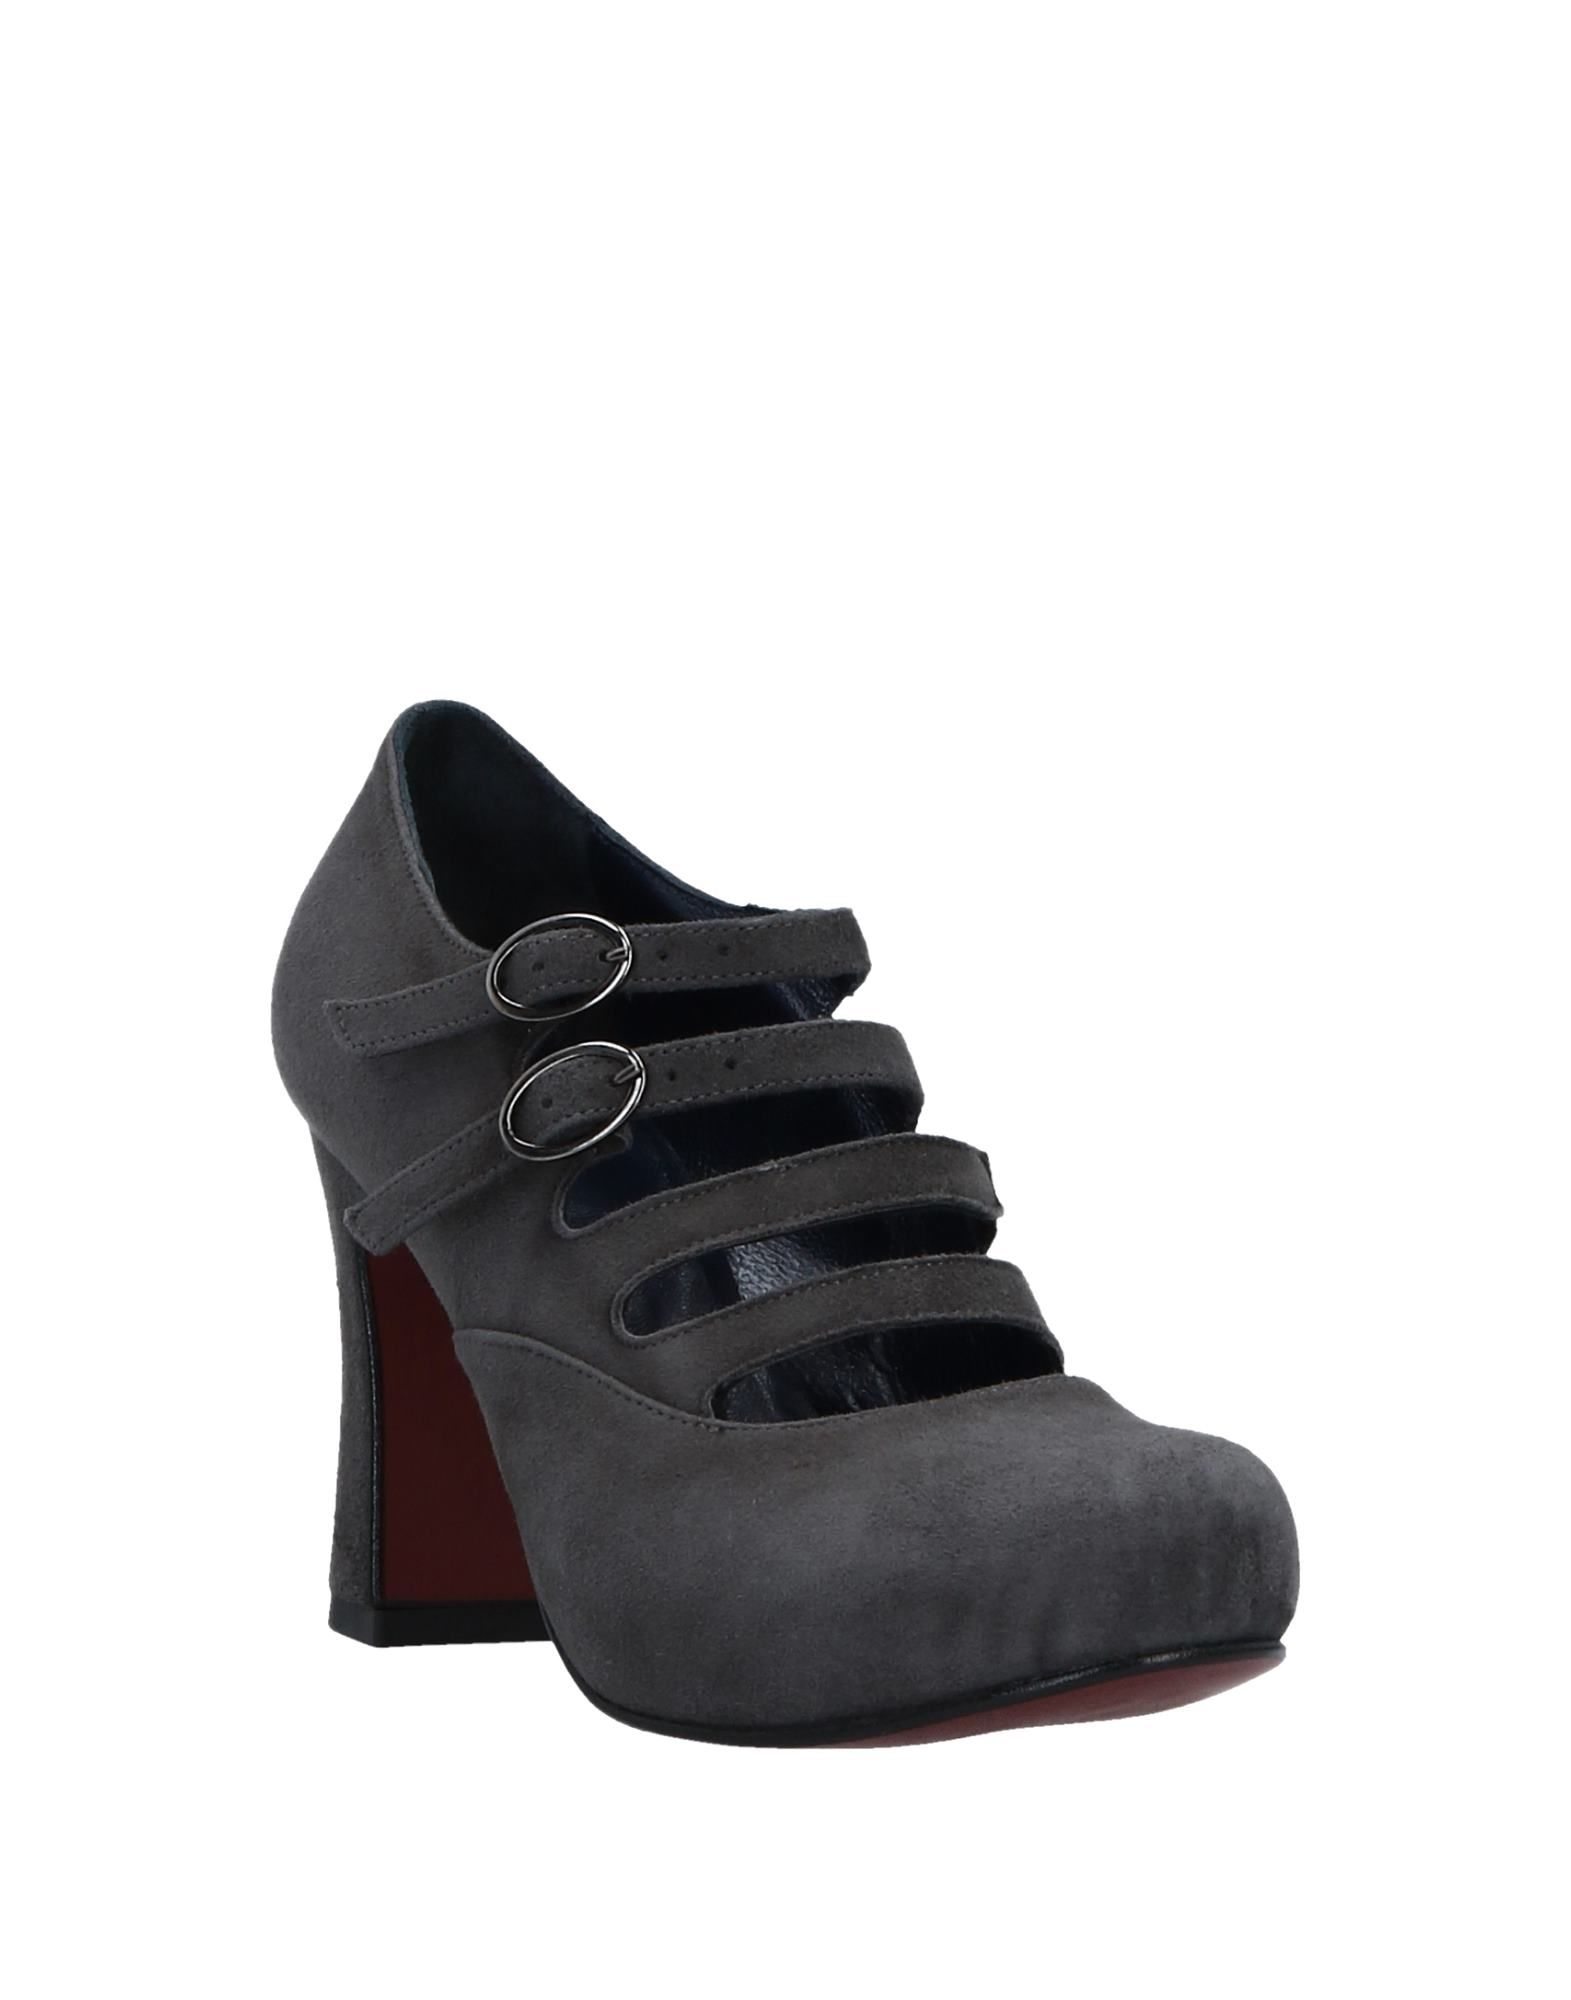 U 11523037BAGut aussehende aussehende aussehende strapazierfähige Schuhe e85597